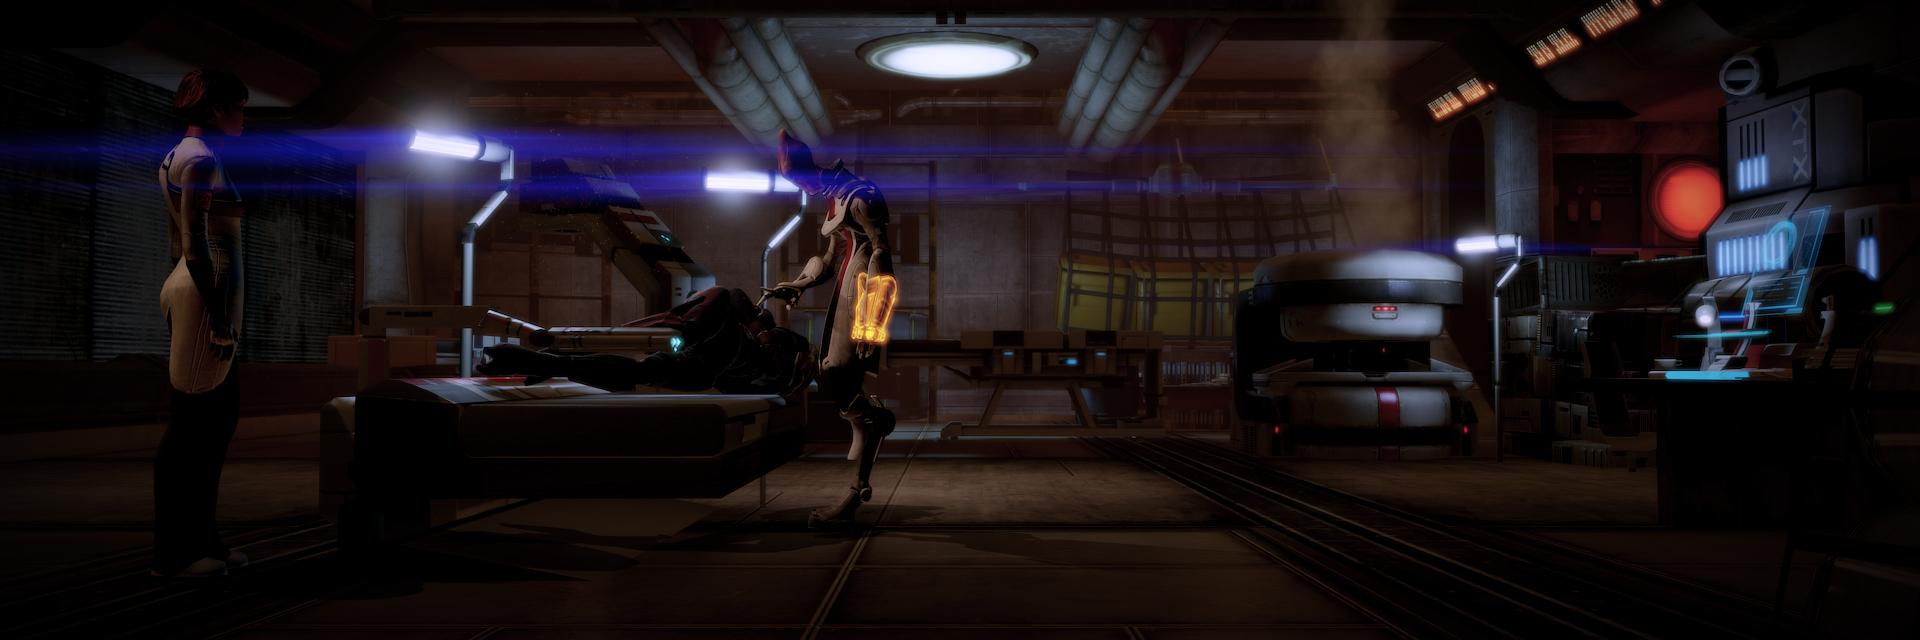 alostsubject.png - Mass Effect 2